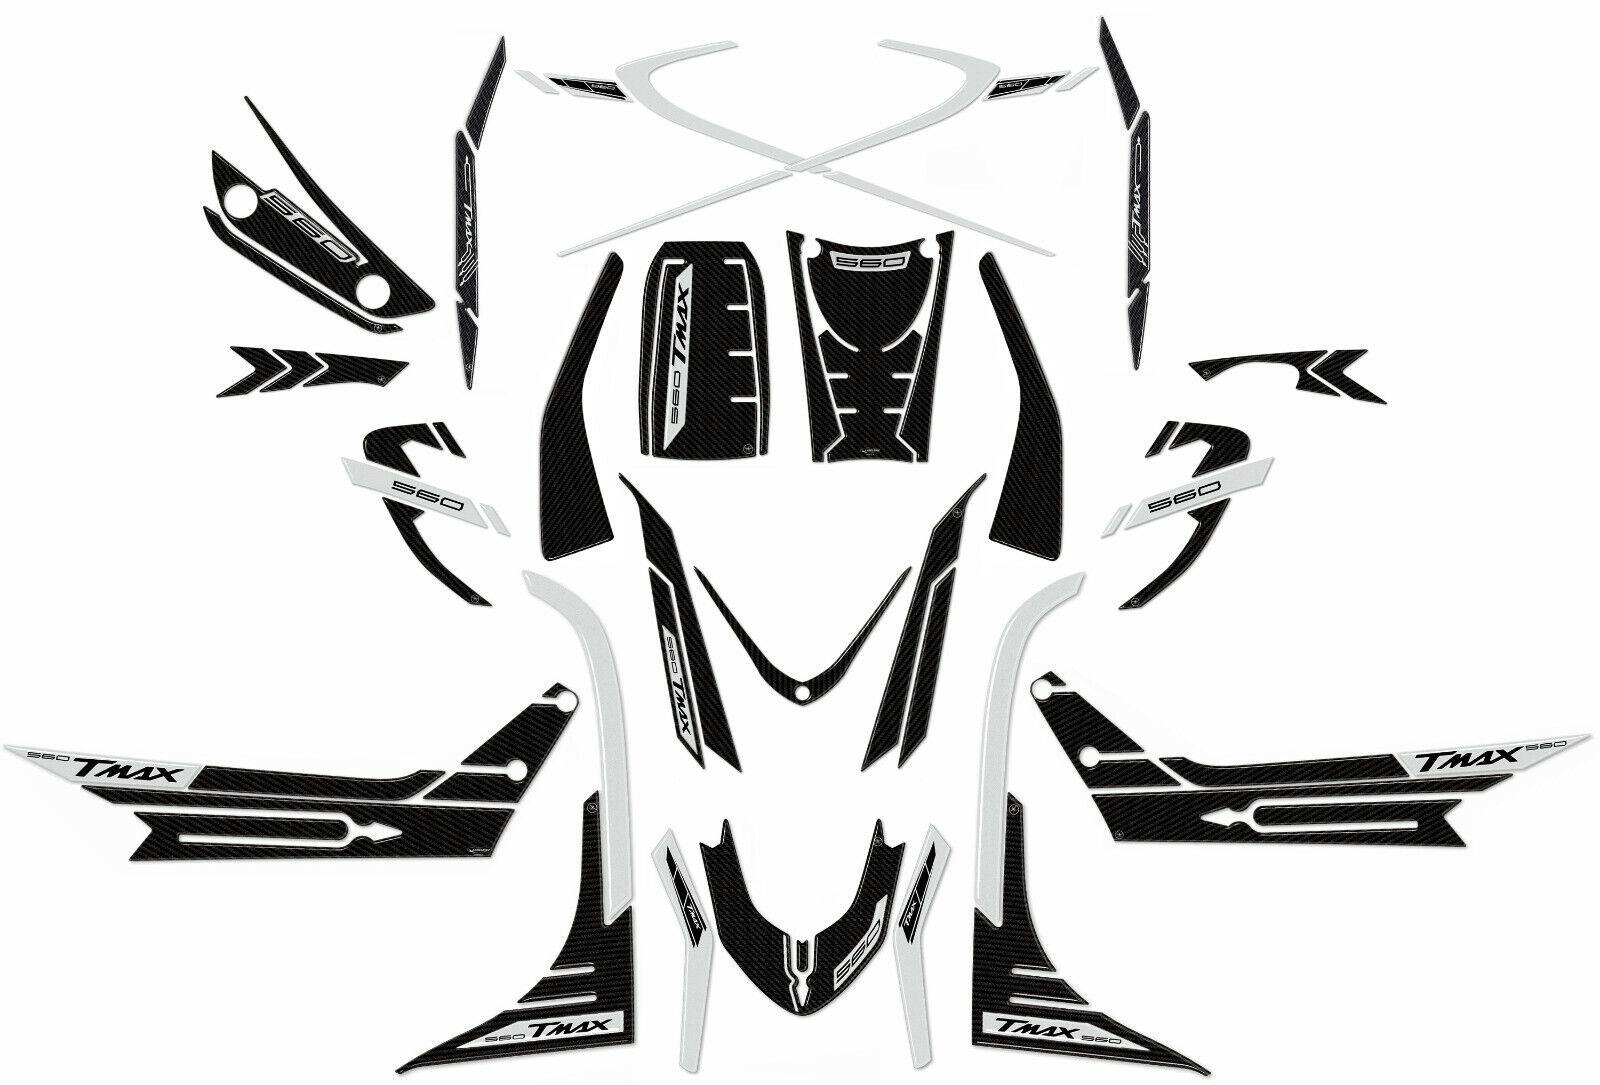 ADESIVI in gel 3D ERGAL per carena Scooter compatibili YAMAHA TMAX 560 dal 2020